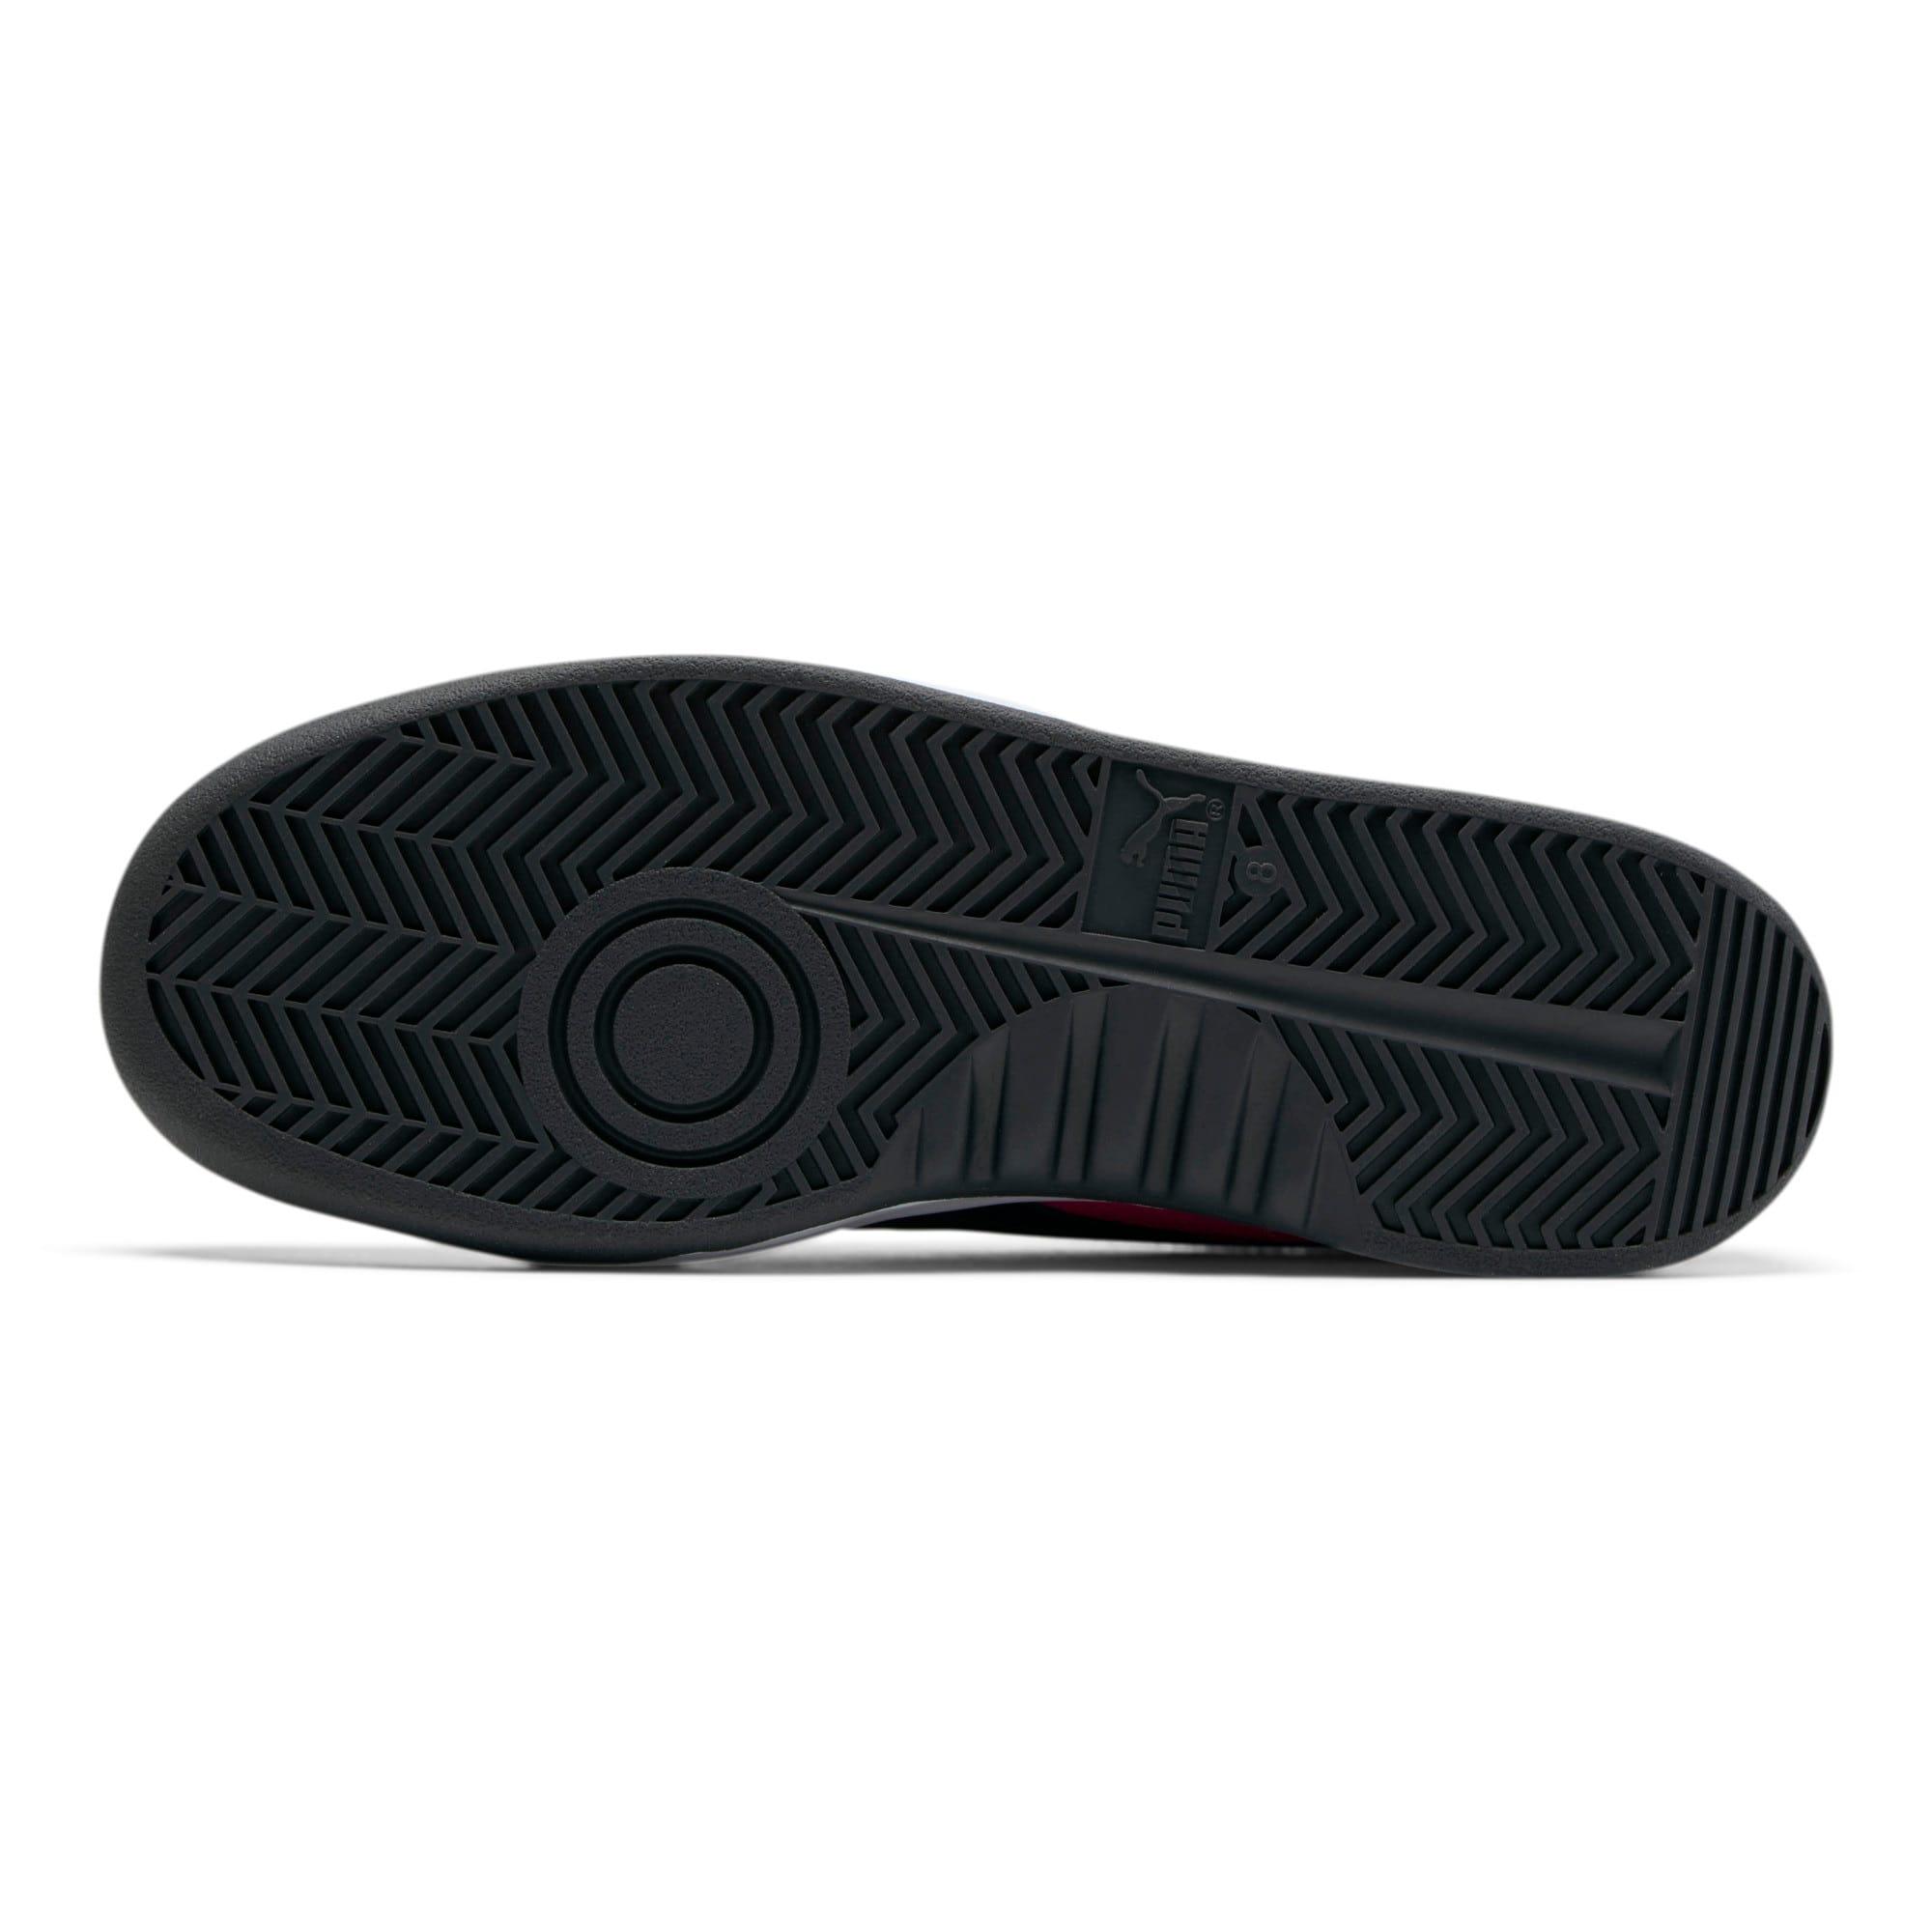 Thumbnail 4 of GV Special + ColorBlock Men's Sneakers, P White-P Blk-Fuchsia Purple, medium